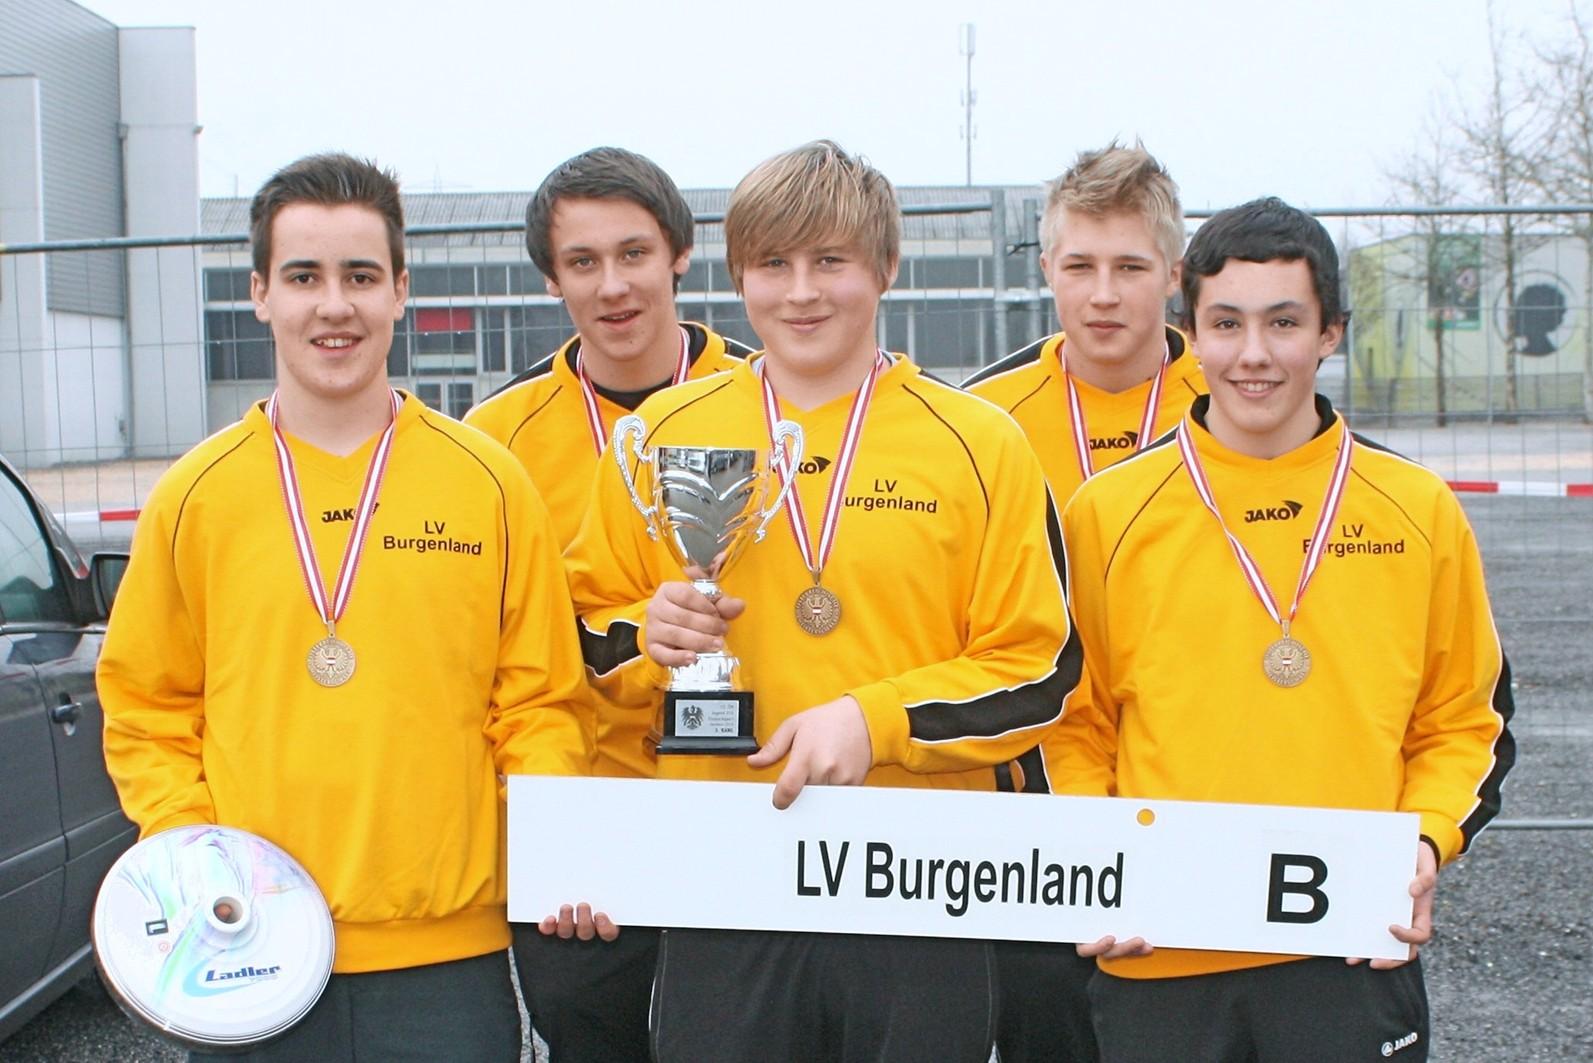 3. Platz bei der ÖM Jugend U16 / 6. Platz bei Junioren U23